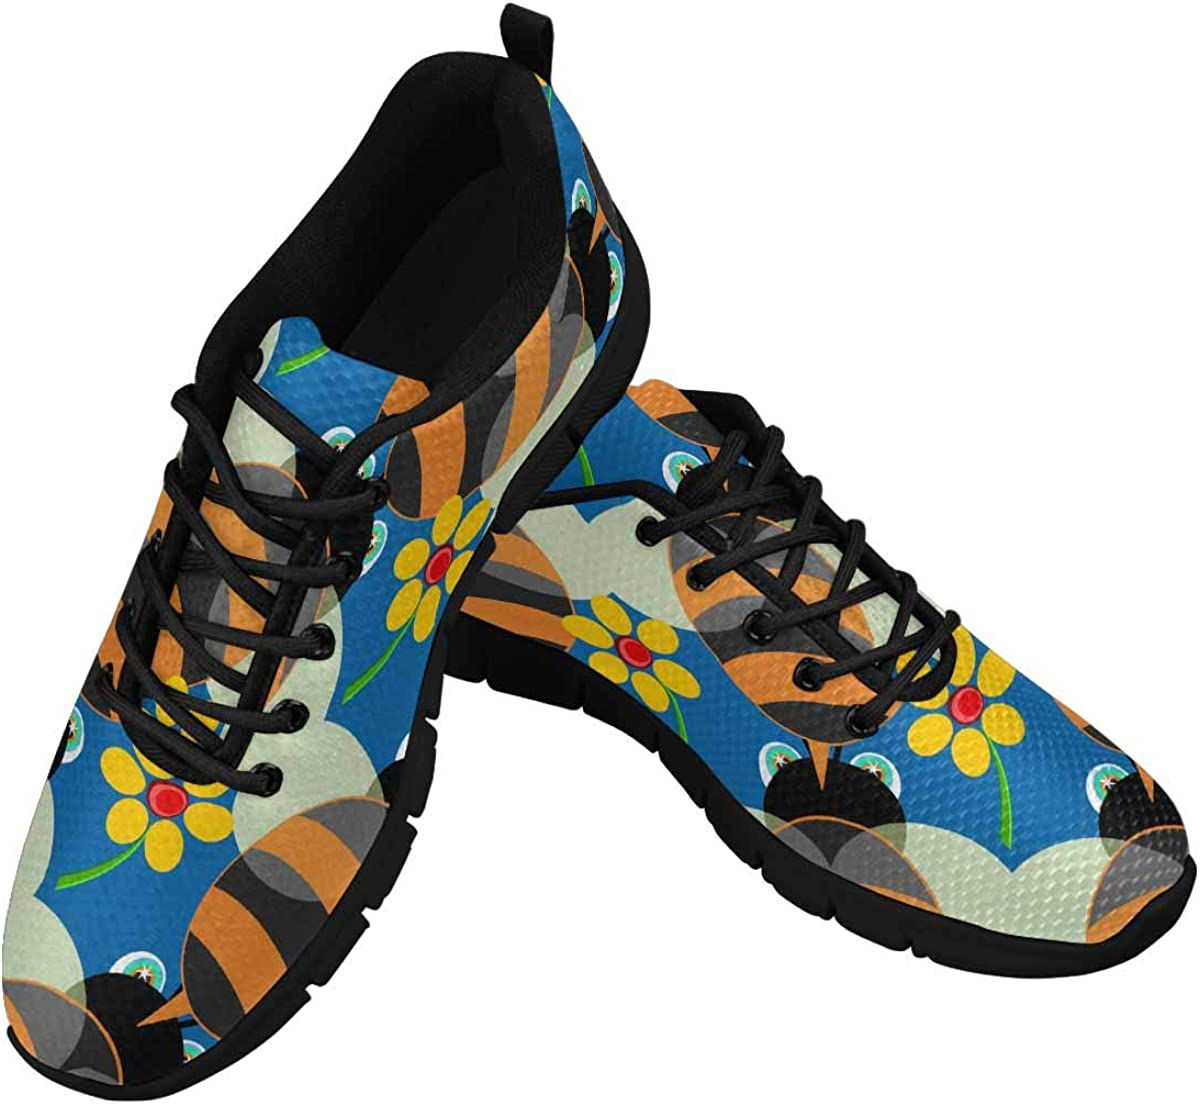 INTERESTPRINT Bees in Blue Women's Athletic Walking Shoes Comfort Mesh Non Slip